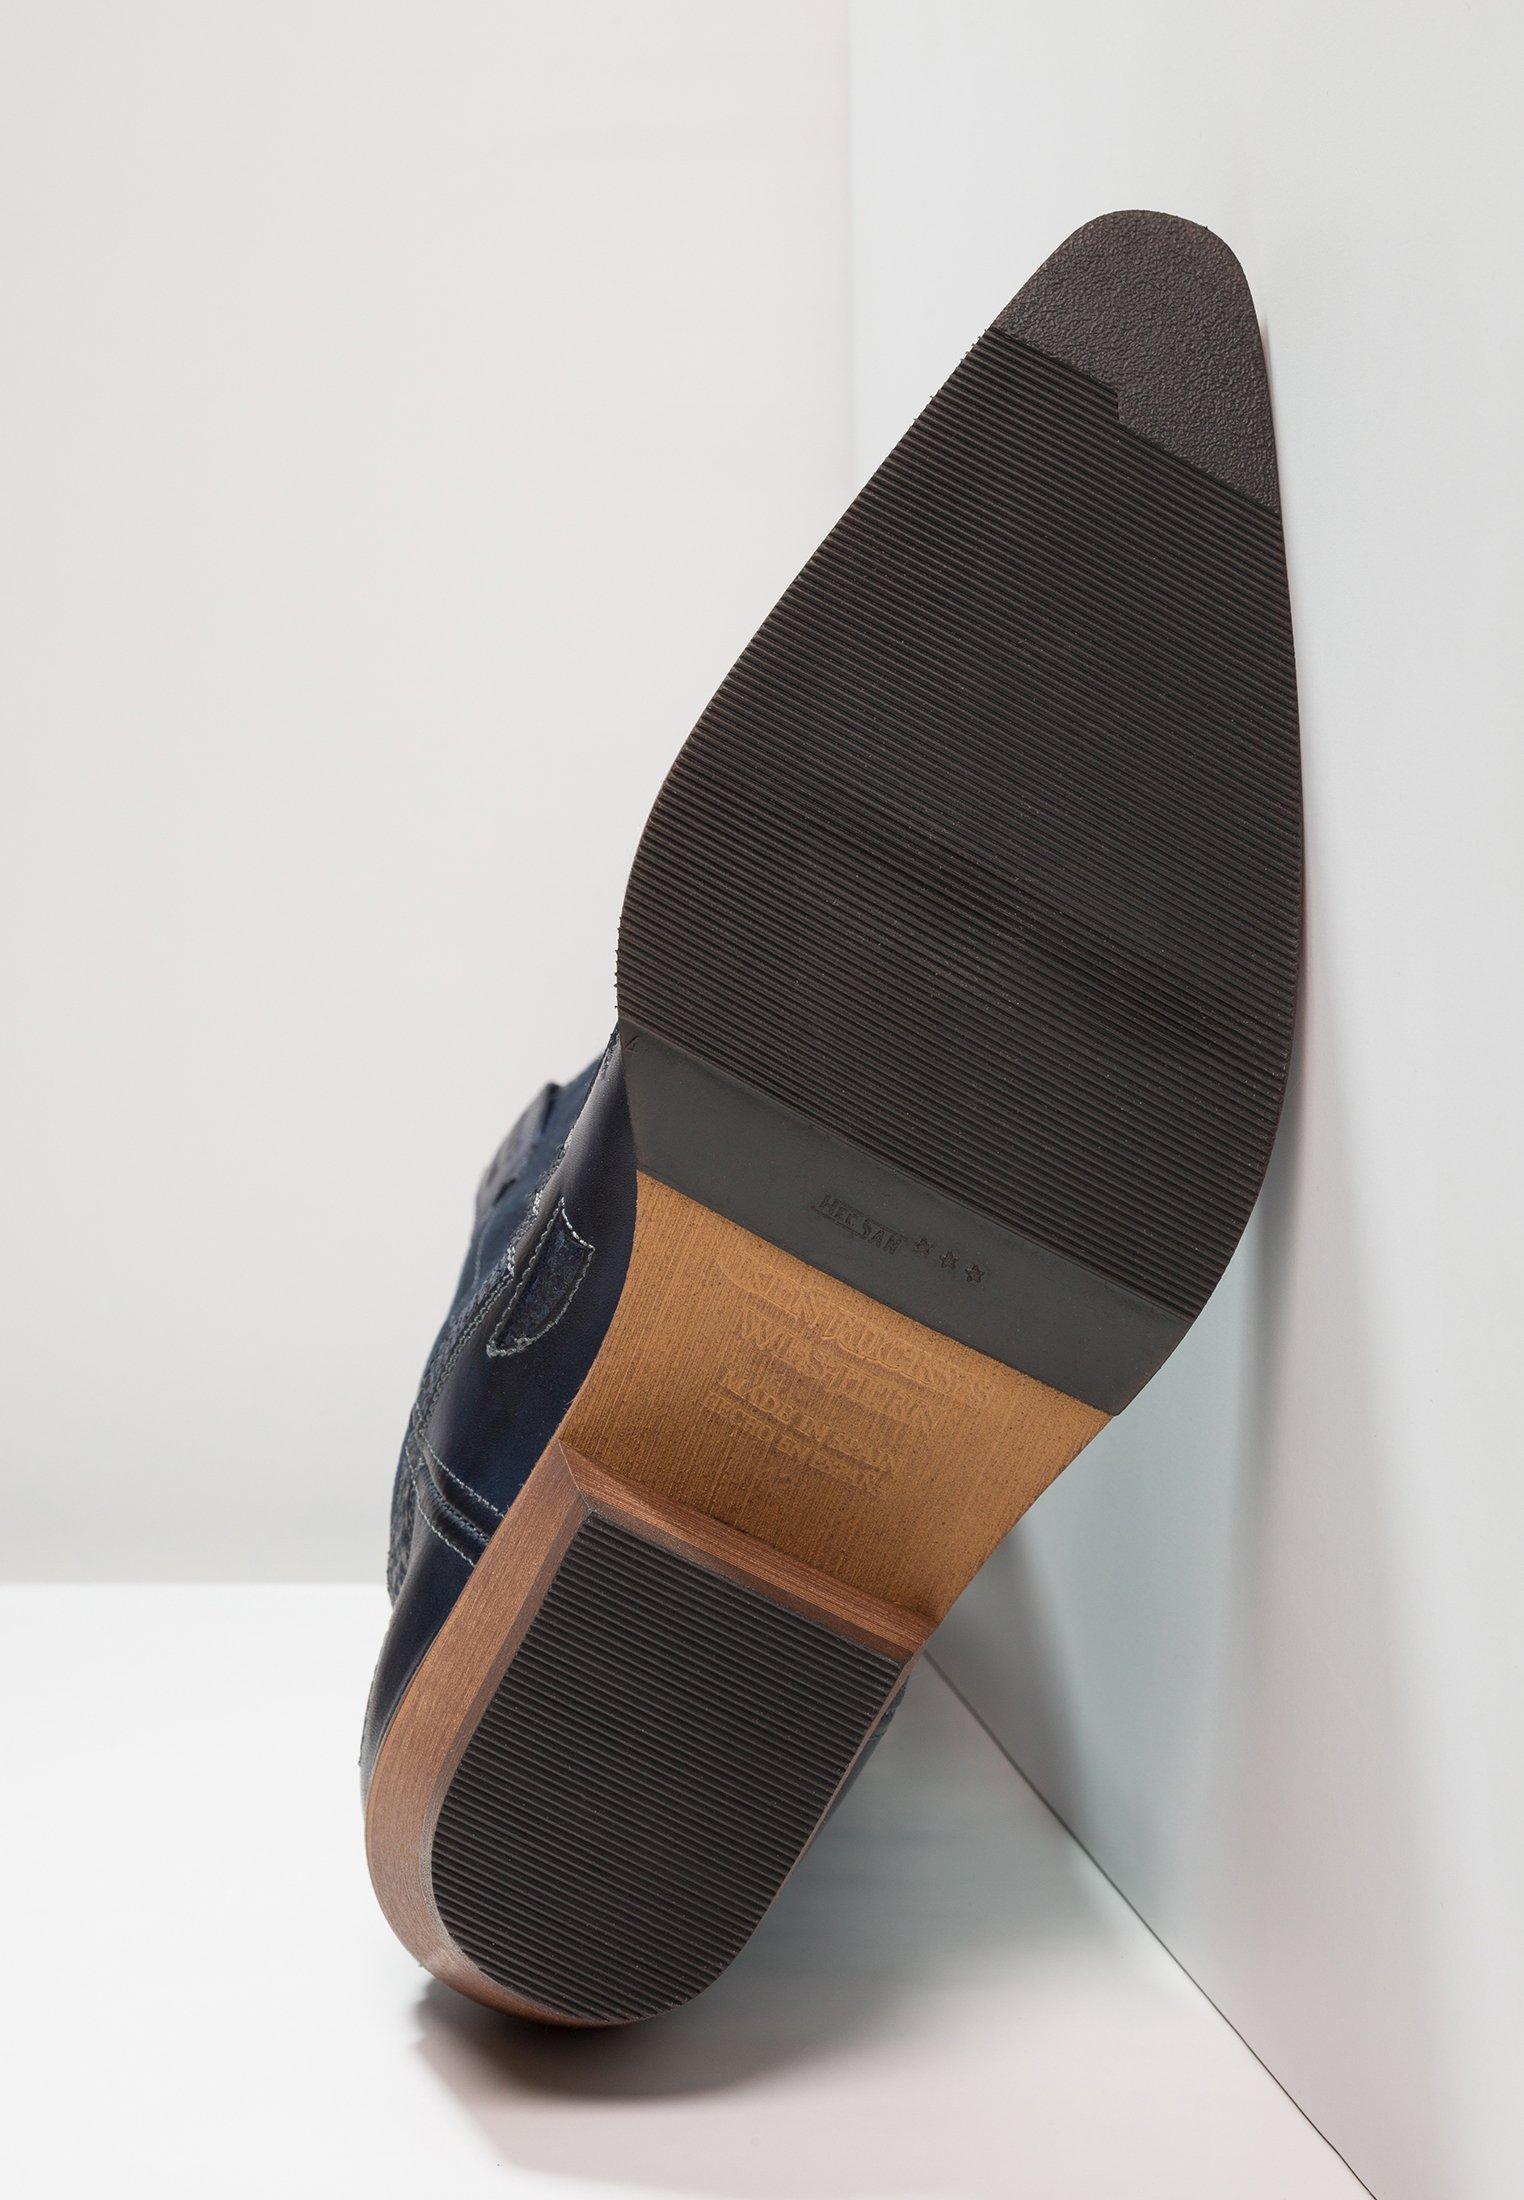 2013 Cheapest Kentucky's Western Cowboy/Biker boots - tint/baltico | men's shoes 2020 Lg95V